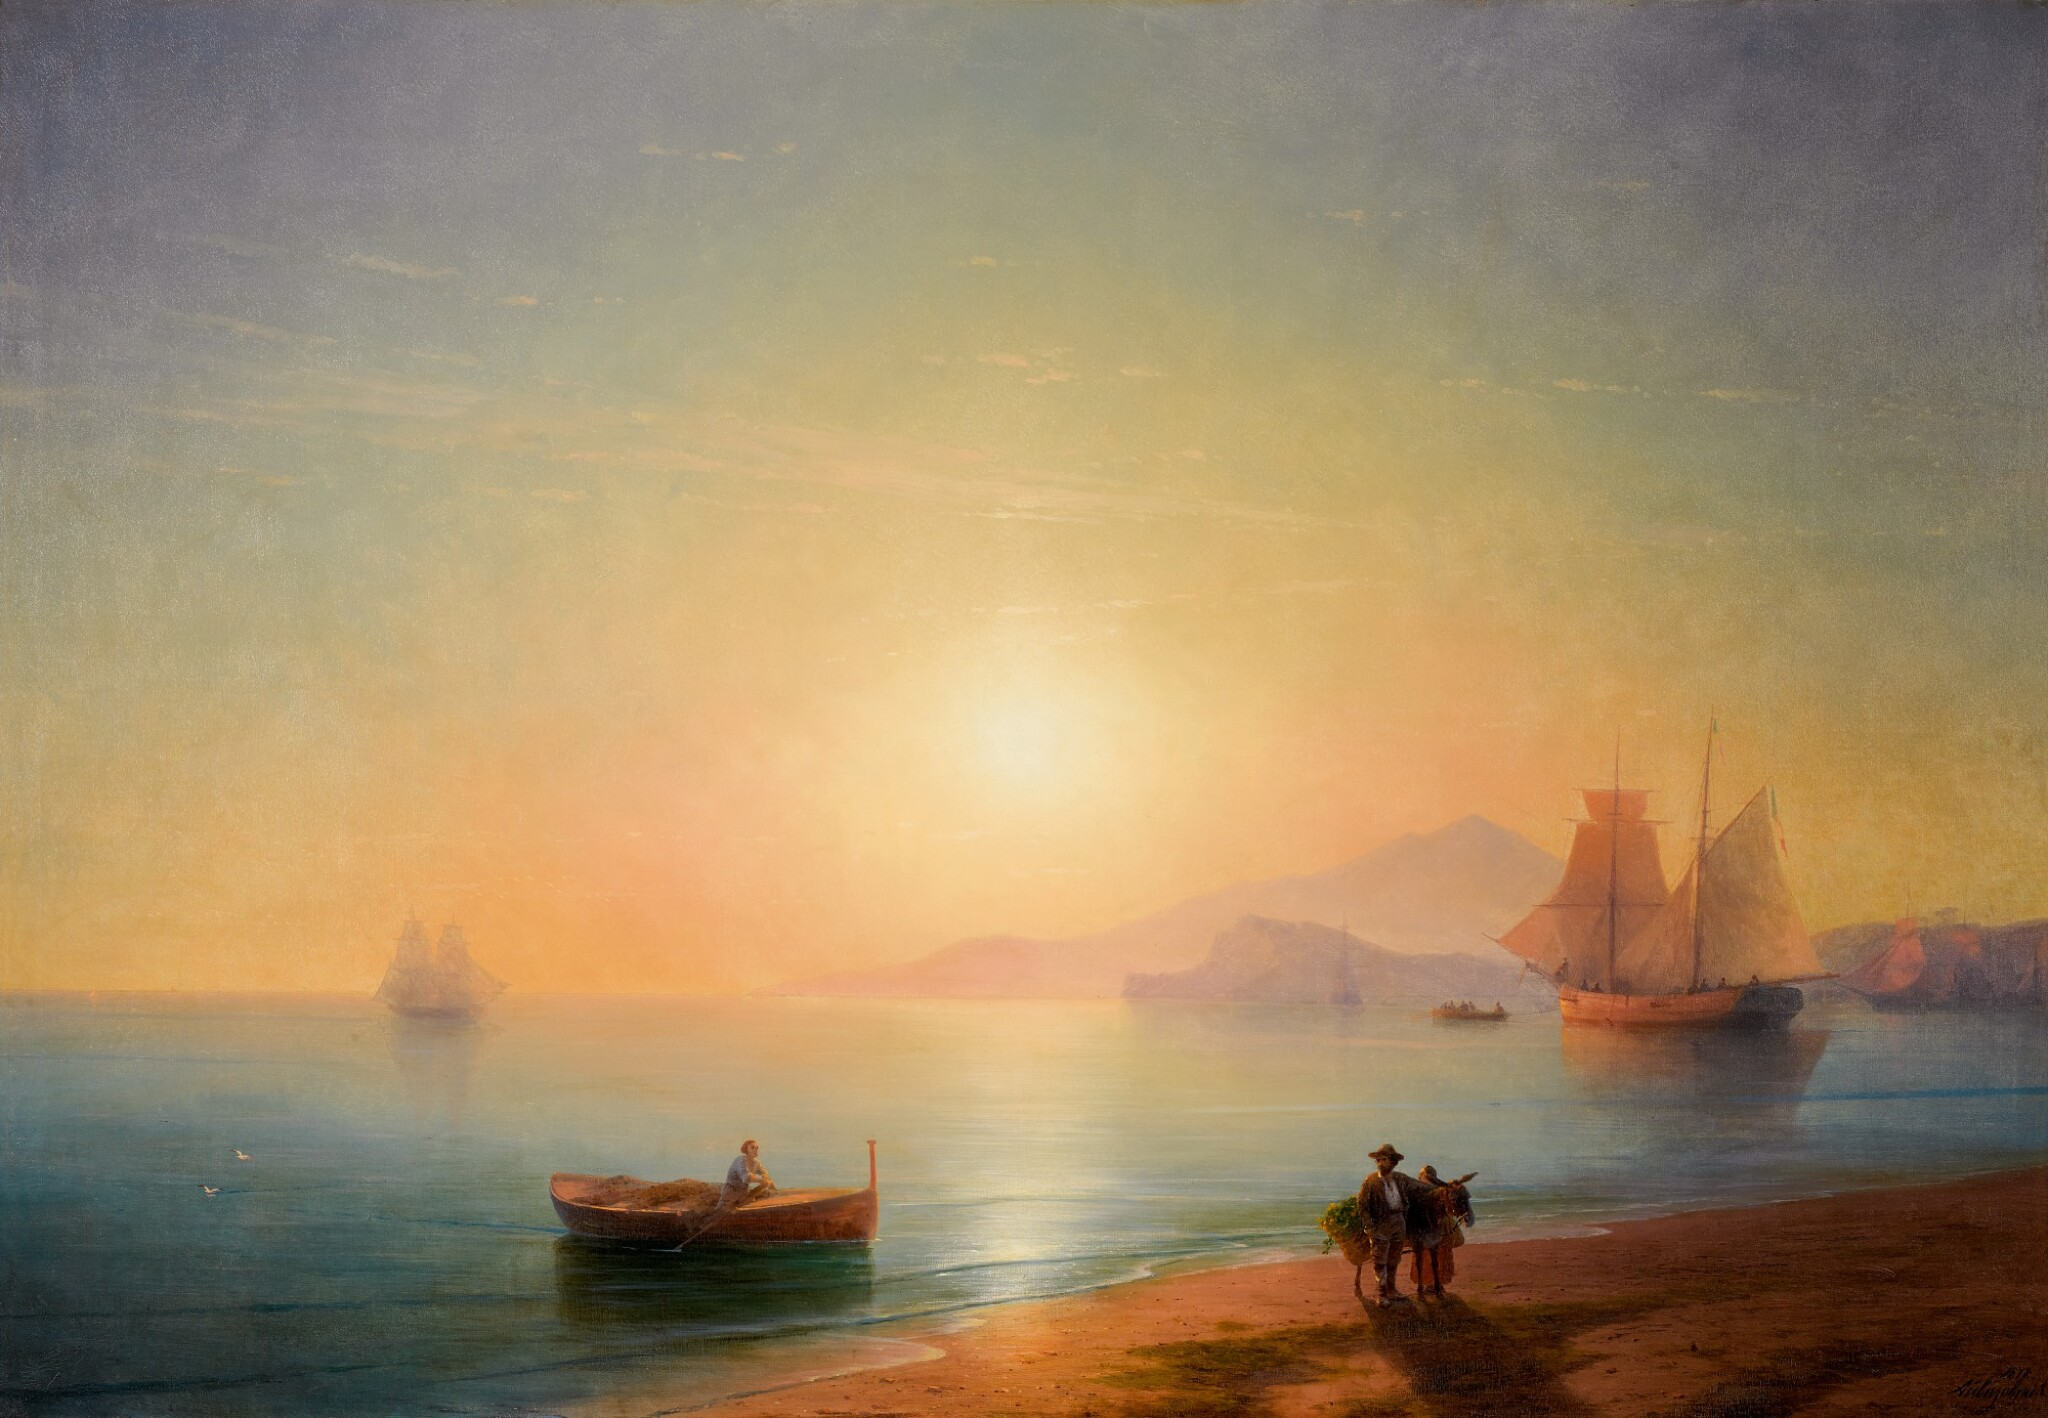 IVAN KONSTANTINOVICH AIVAZOVSKY | THE BAY OF NAPLES